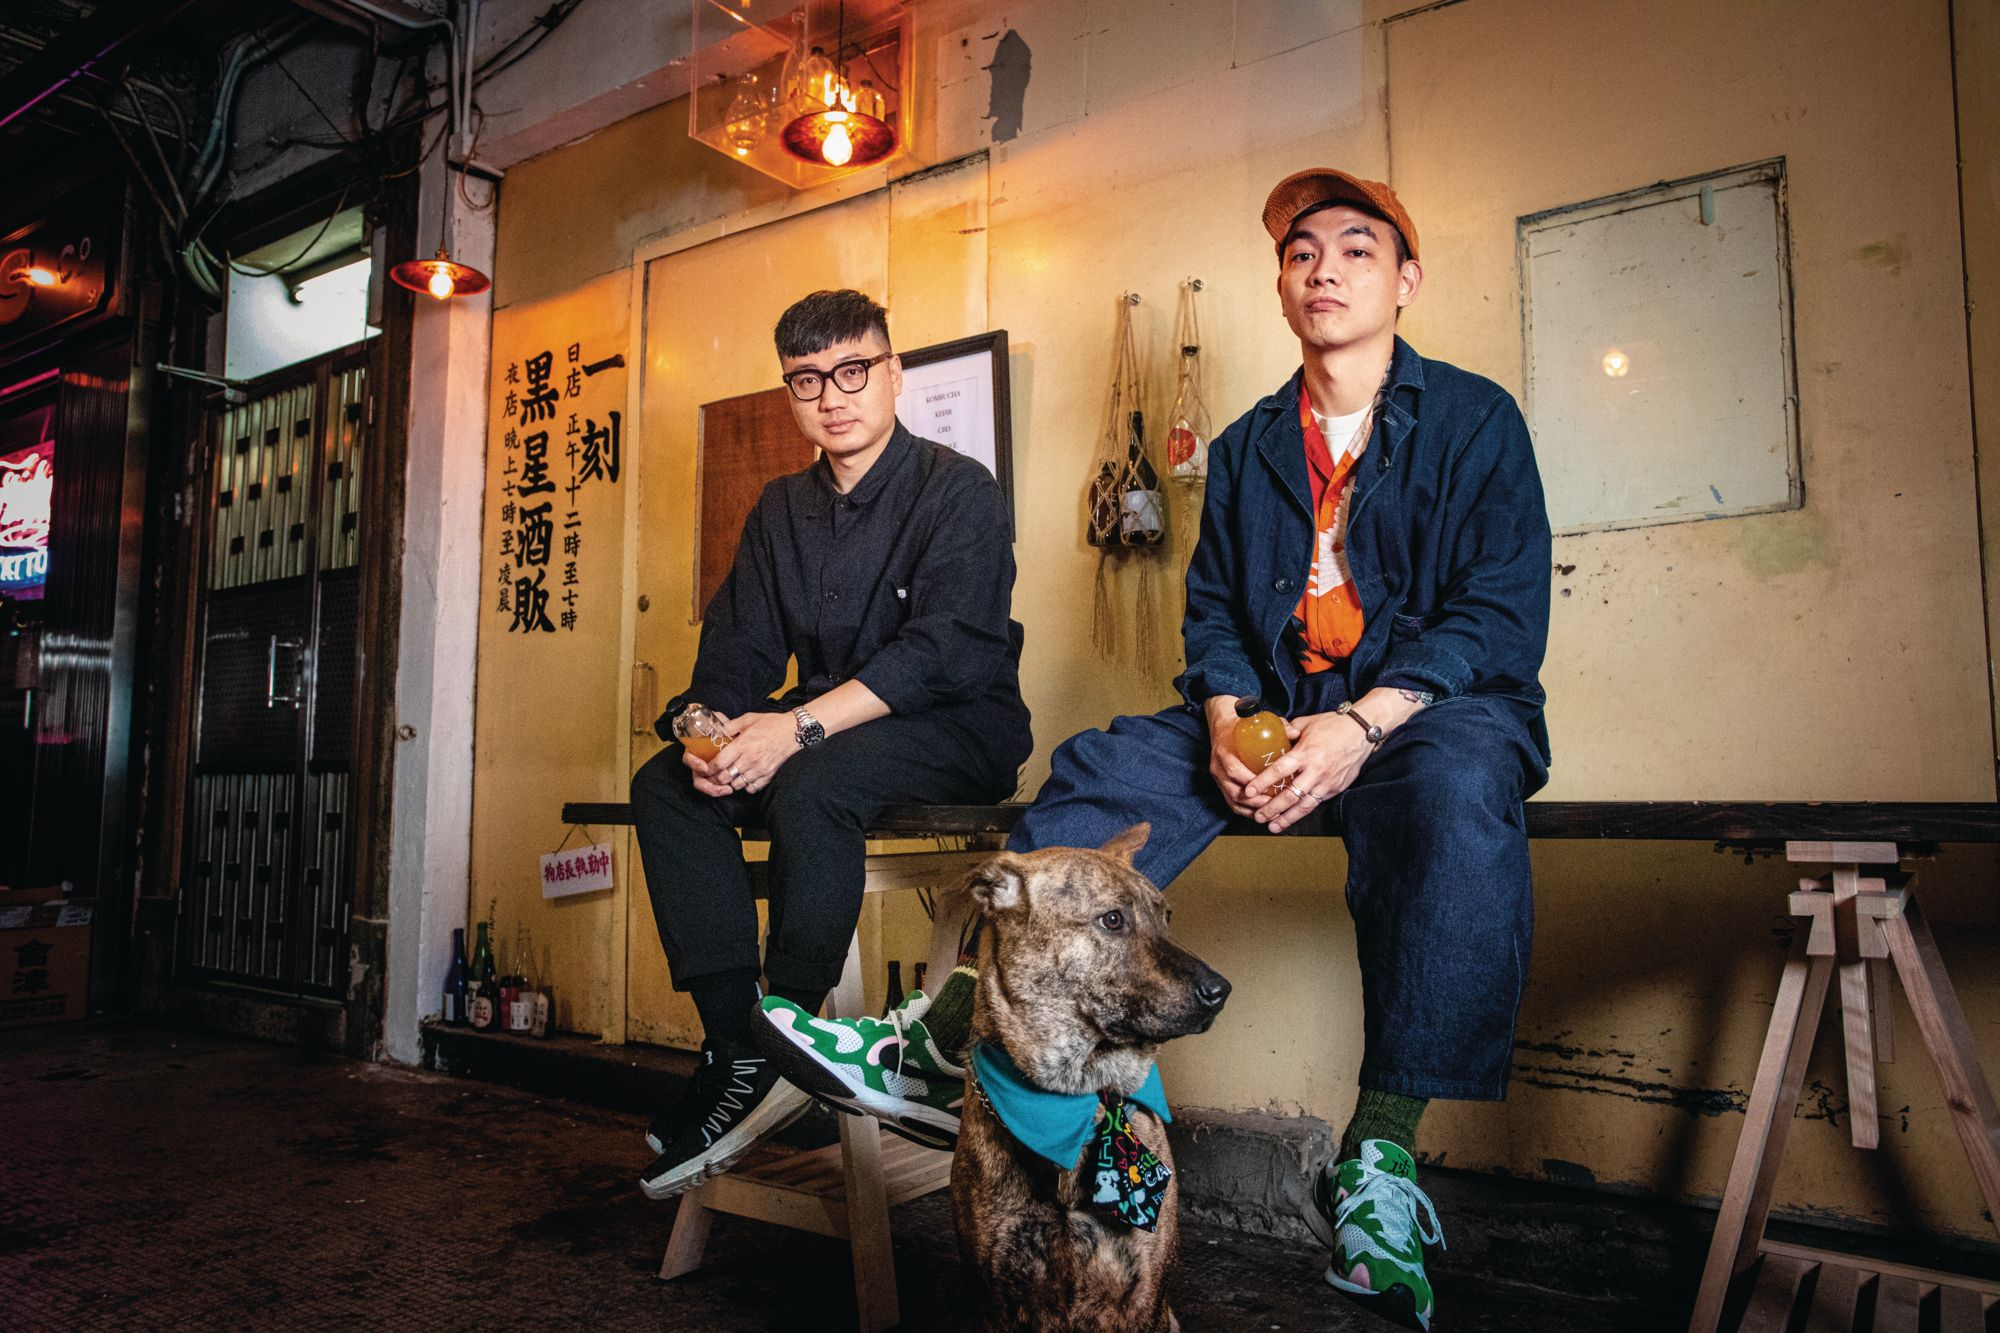 Meet The Duo Behind Black Star Liquor Co., A New CBD Drinks Shop In Causeway Bay